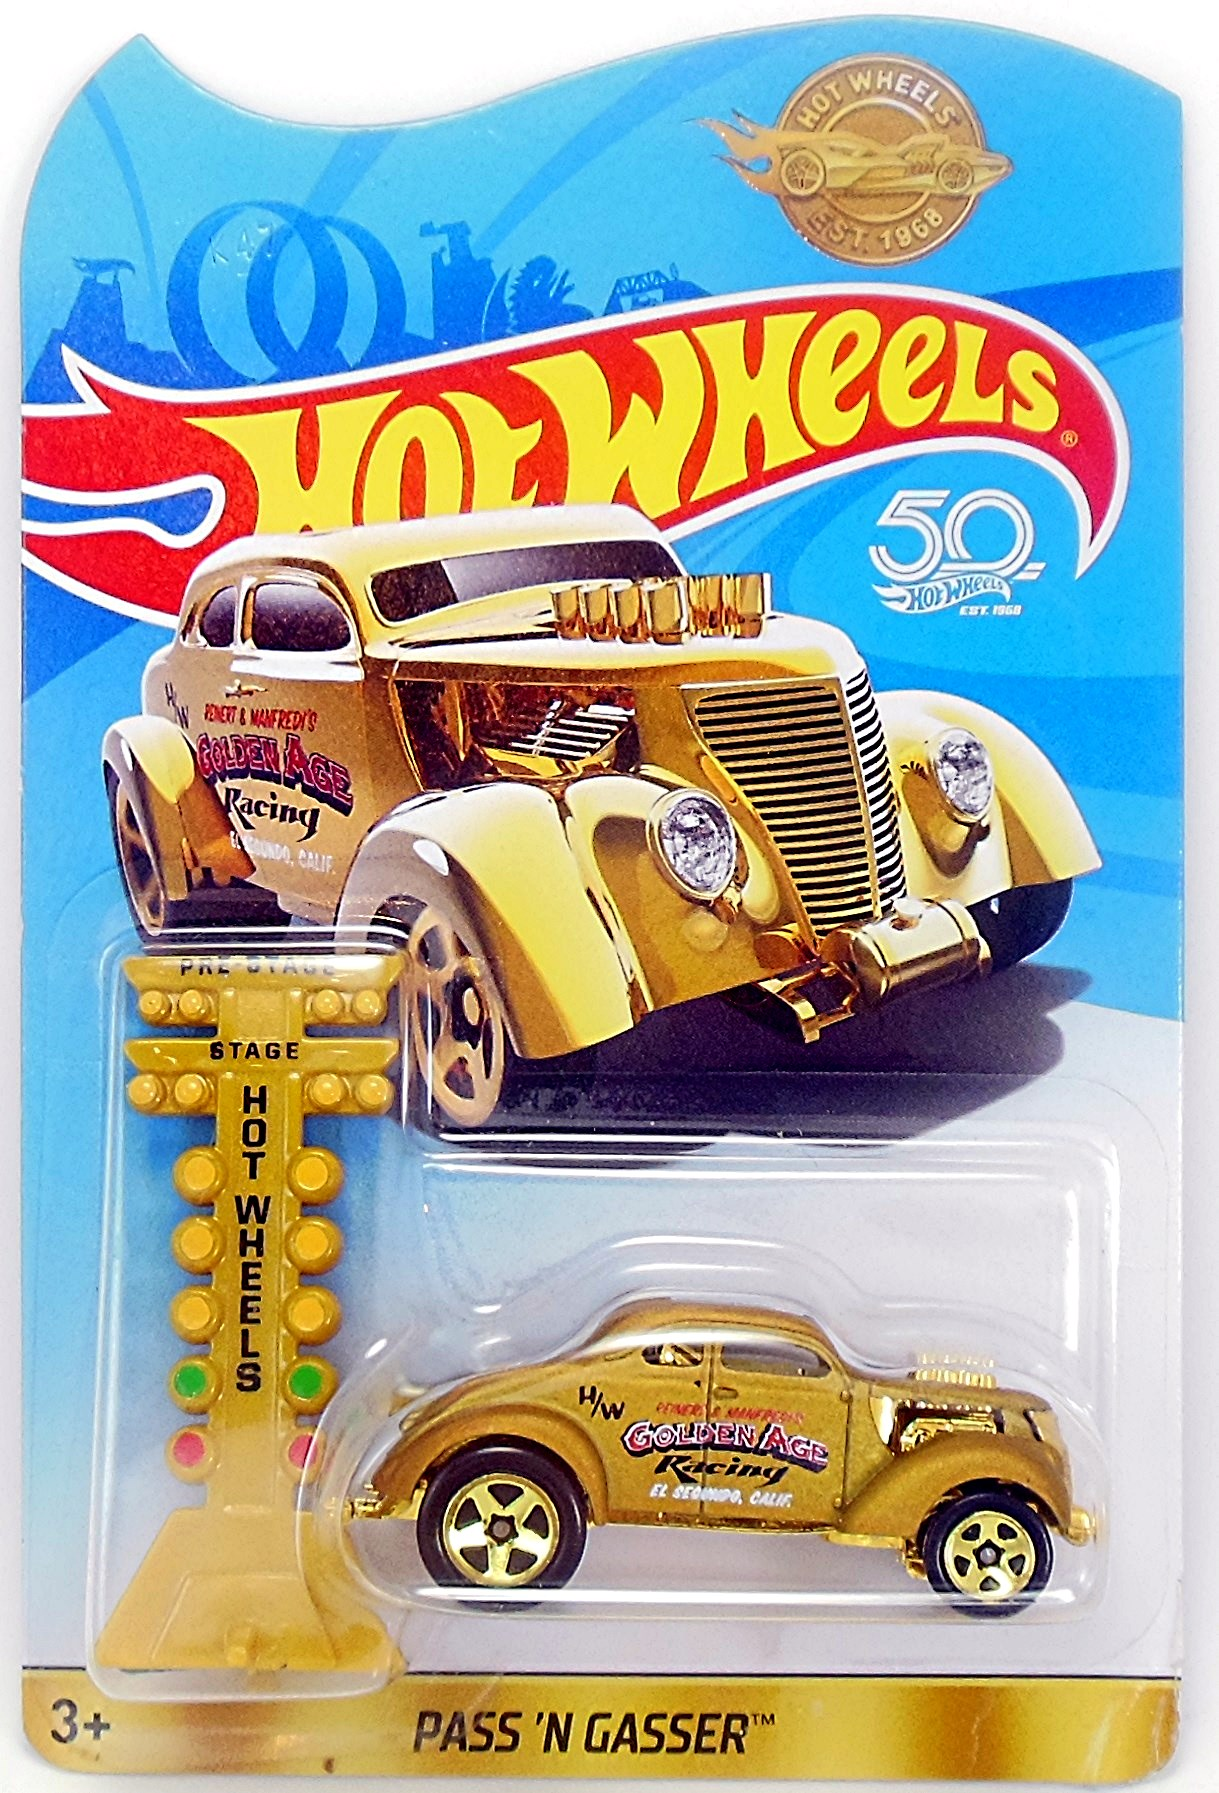 Gold Pass'n Gasser Promotion | Hot Wheels Newsletter